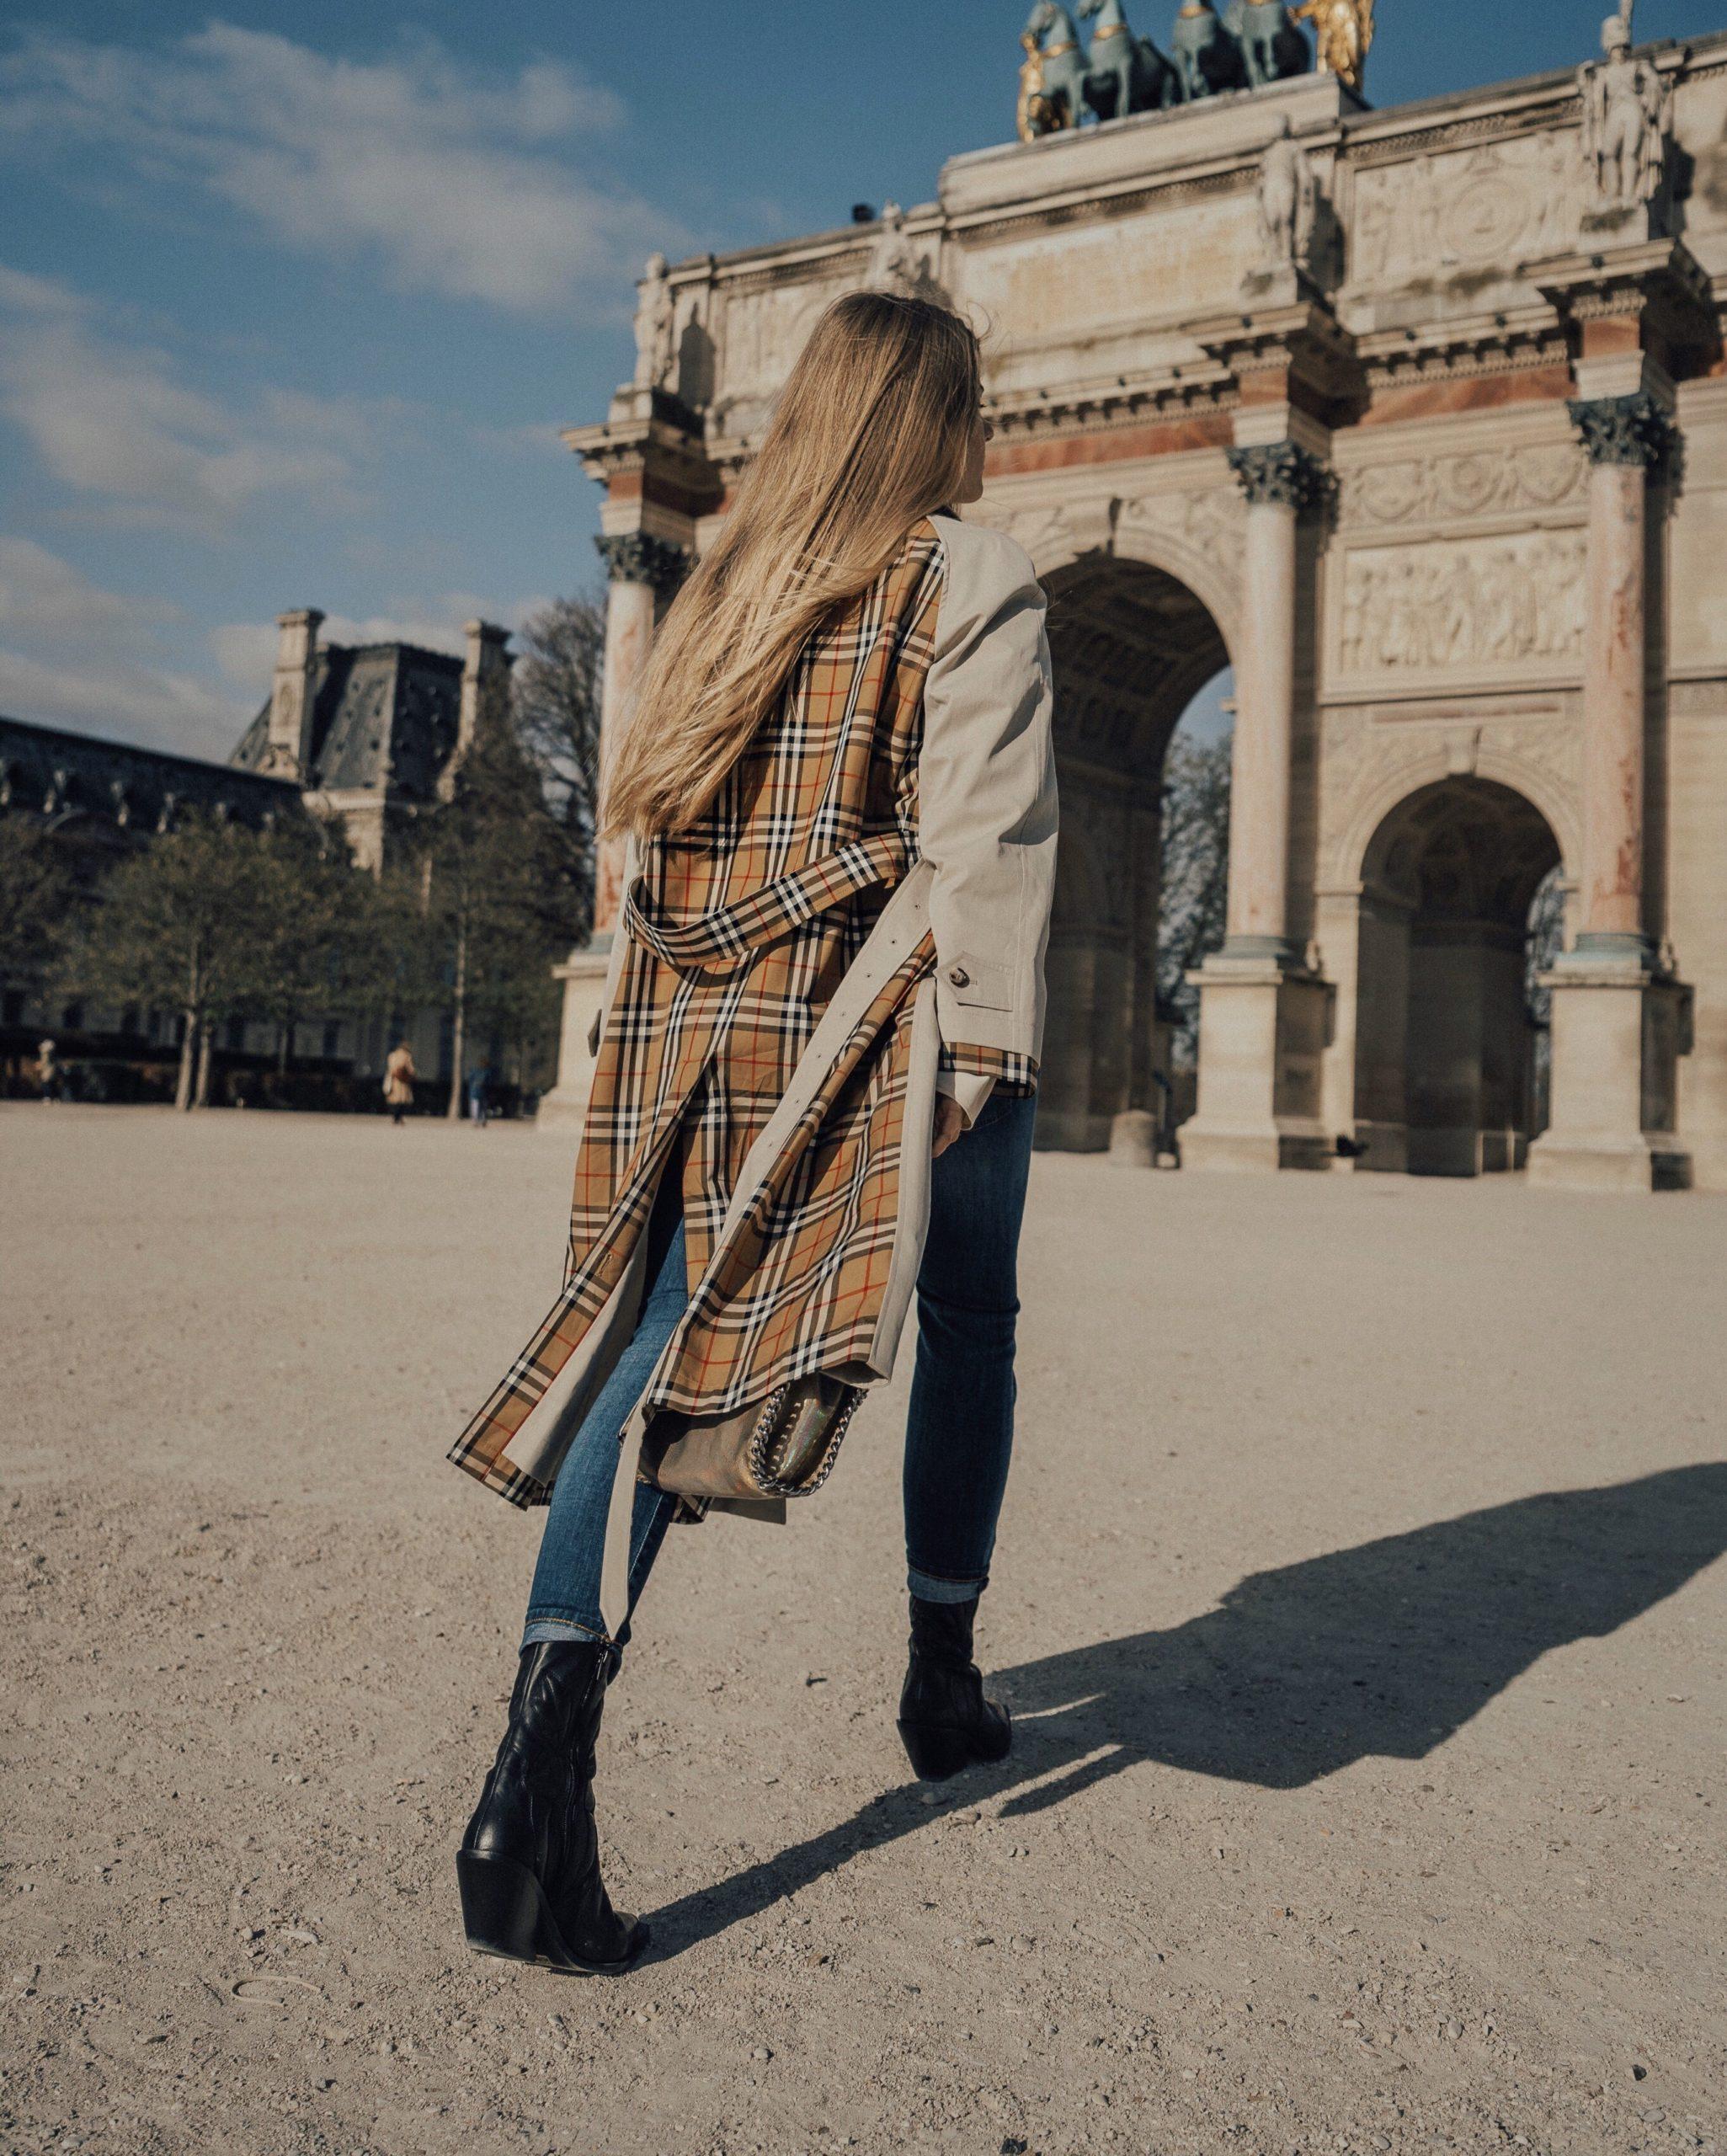 10 der schönsten Fotolocations in Paris, Arc de Triomphe du Carrousel, 7